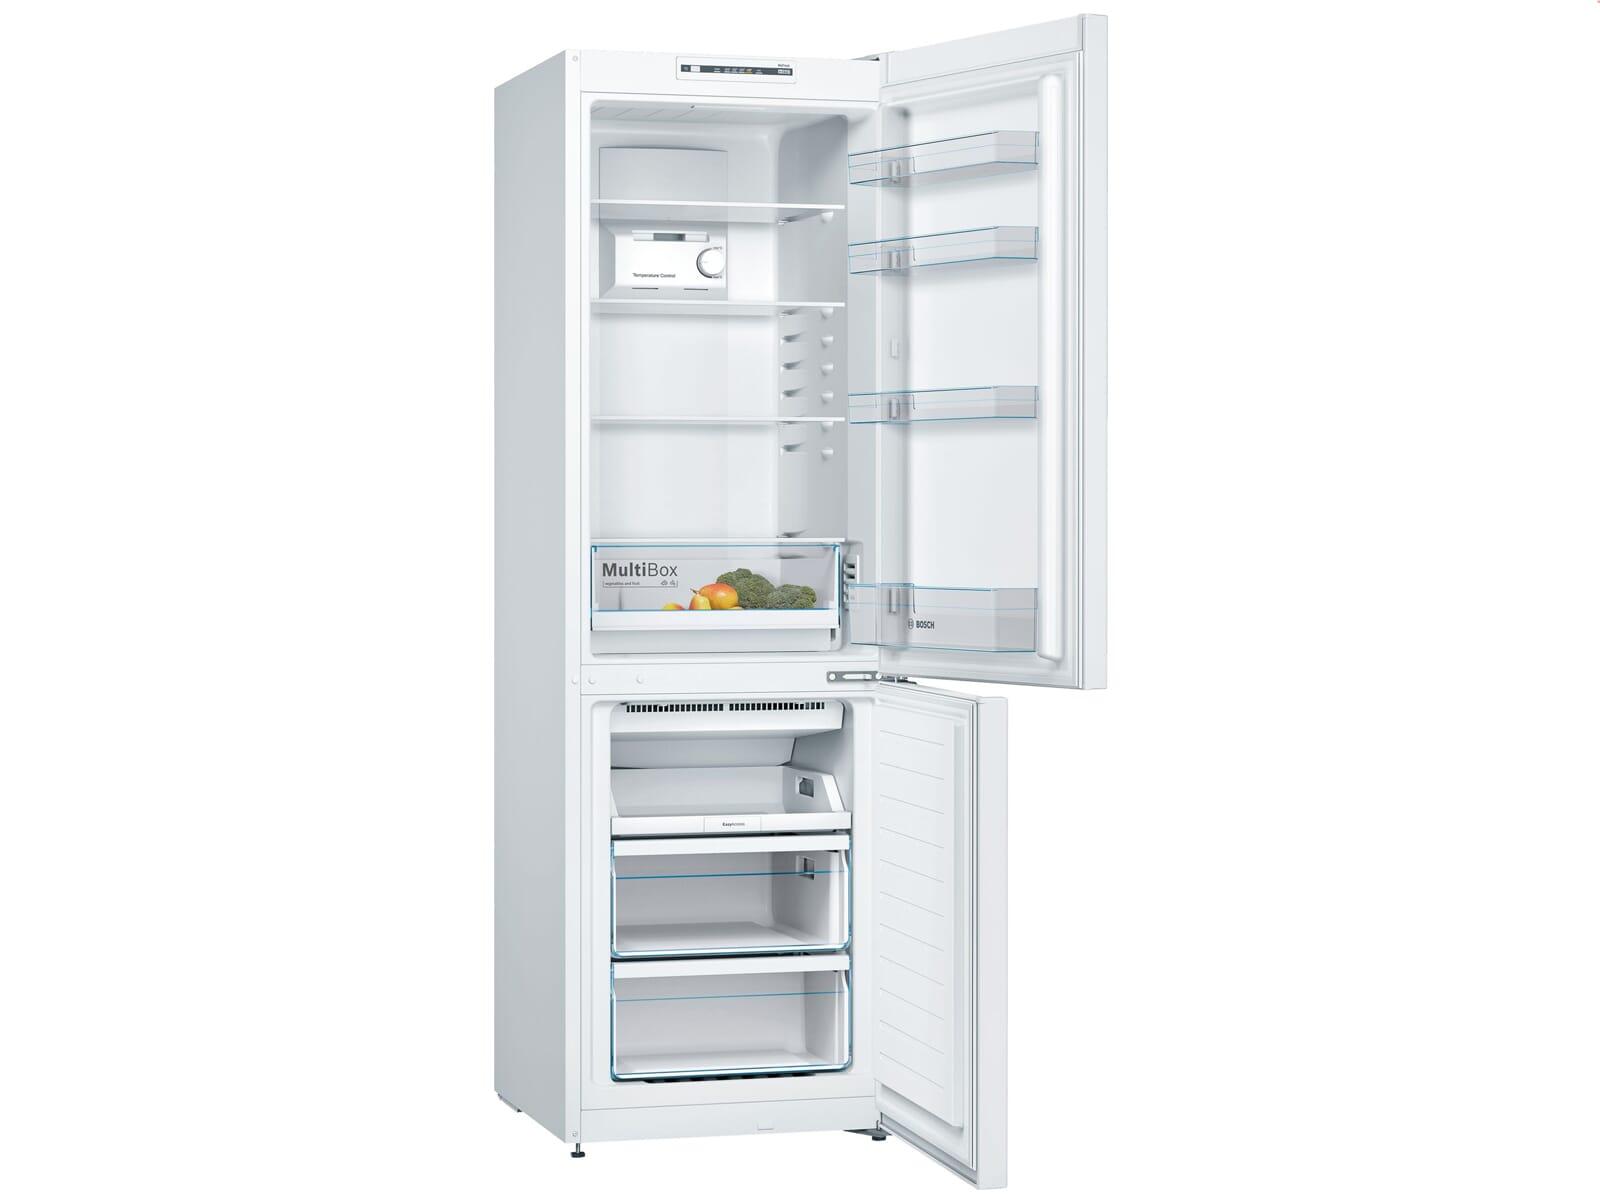 Bosch Kühlschrank Kgn 39 Xi 41 : Bosch kgn nw kühl gefrierkombination weiß kühlschrank